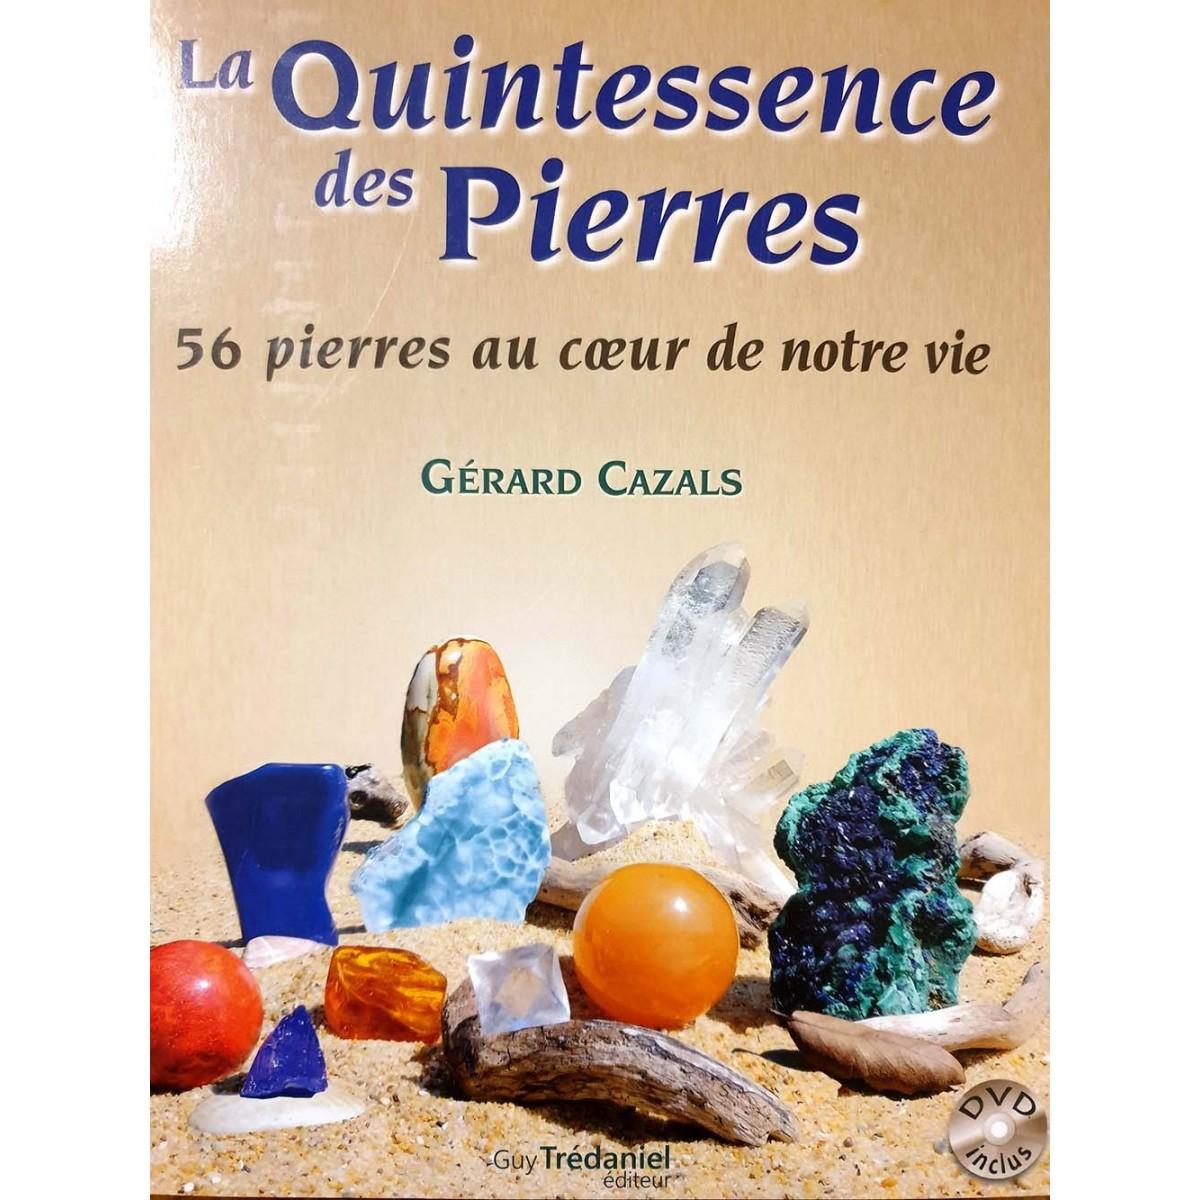 La Quintessence des Pierres